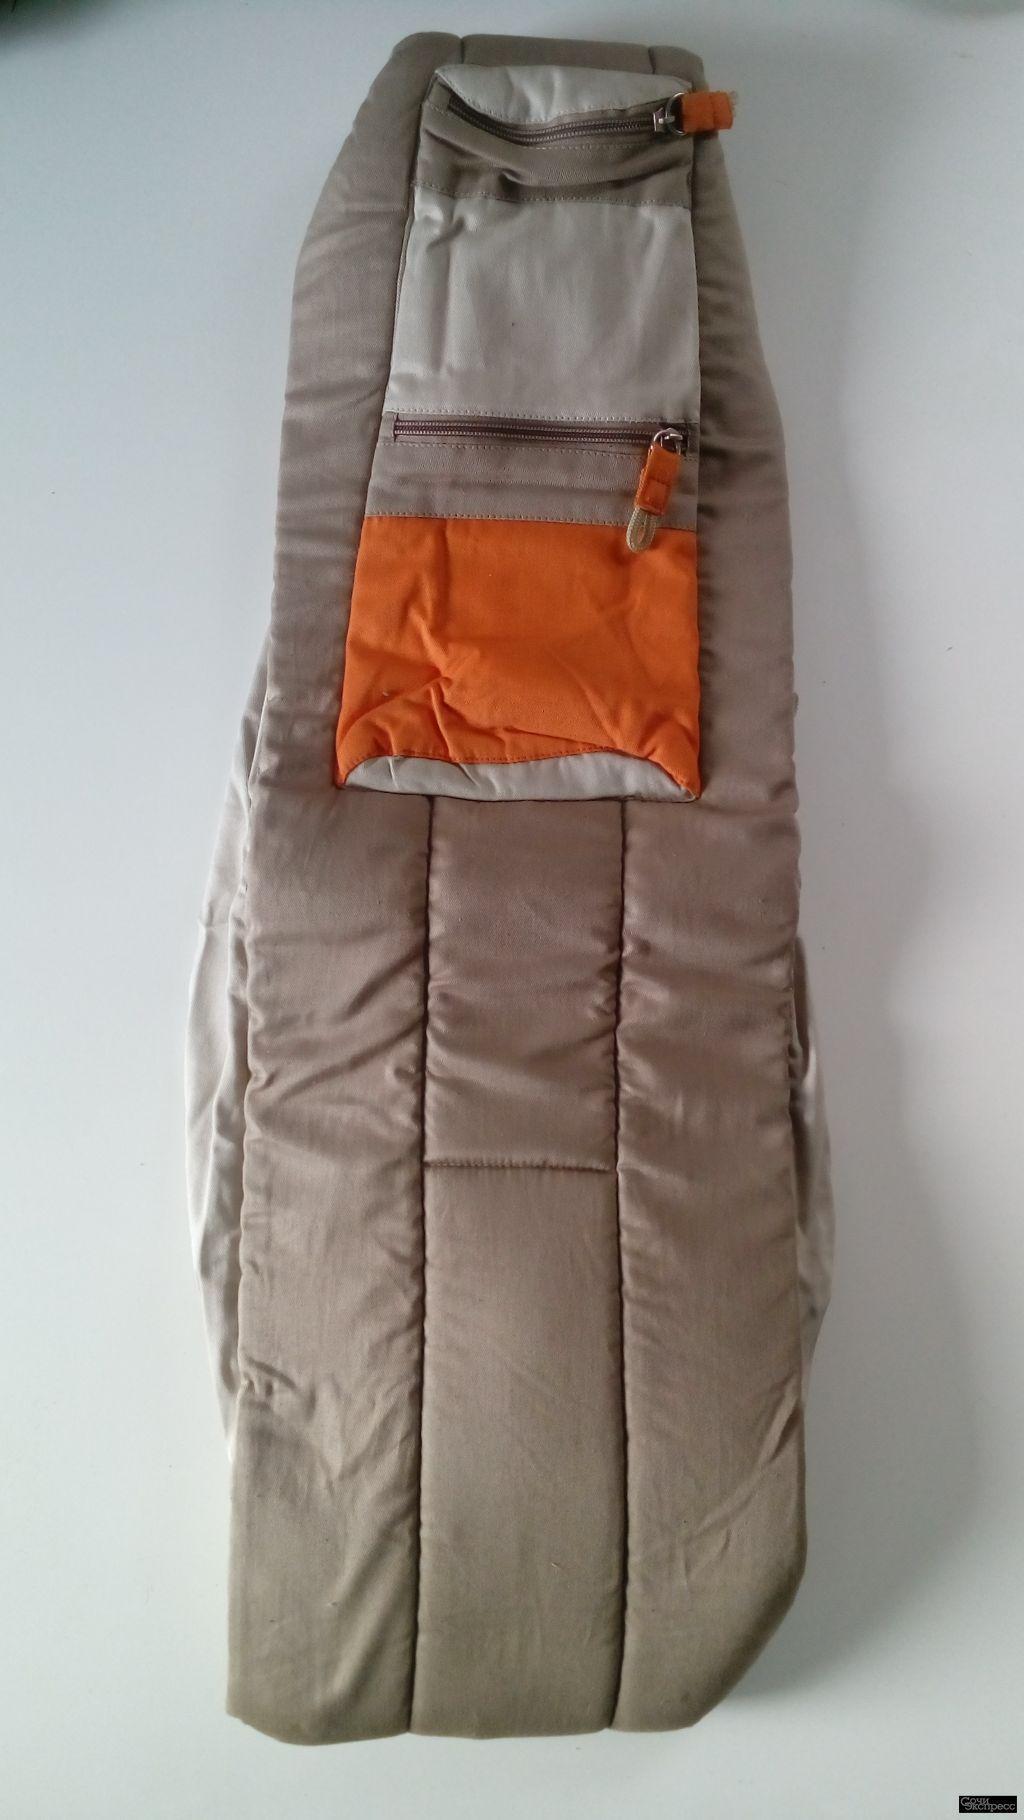 Слинг Premaxx Baby Bag два в одном Сахара (беж+оранж) новый